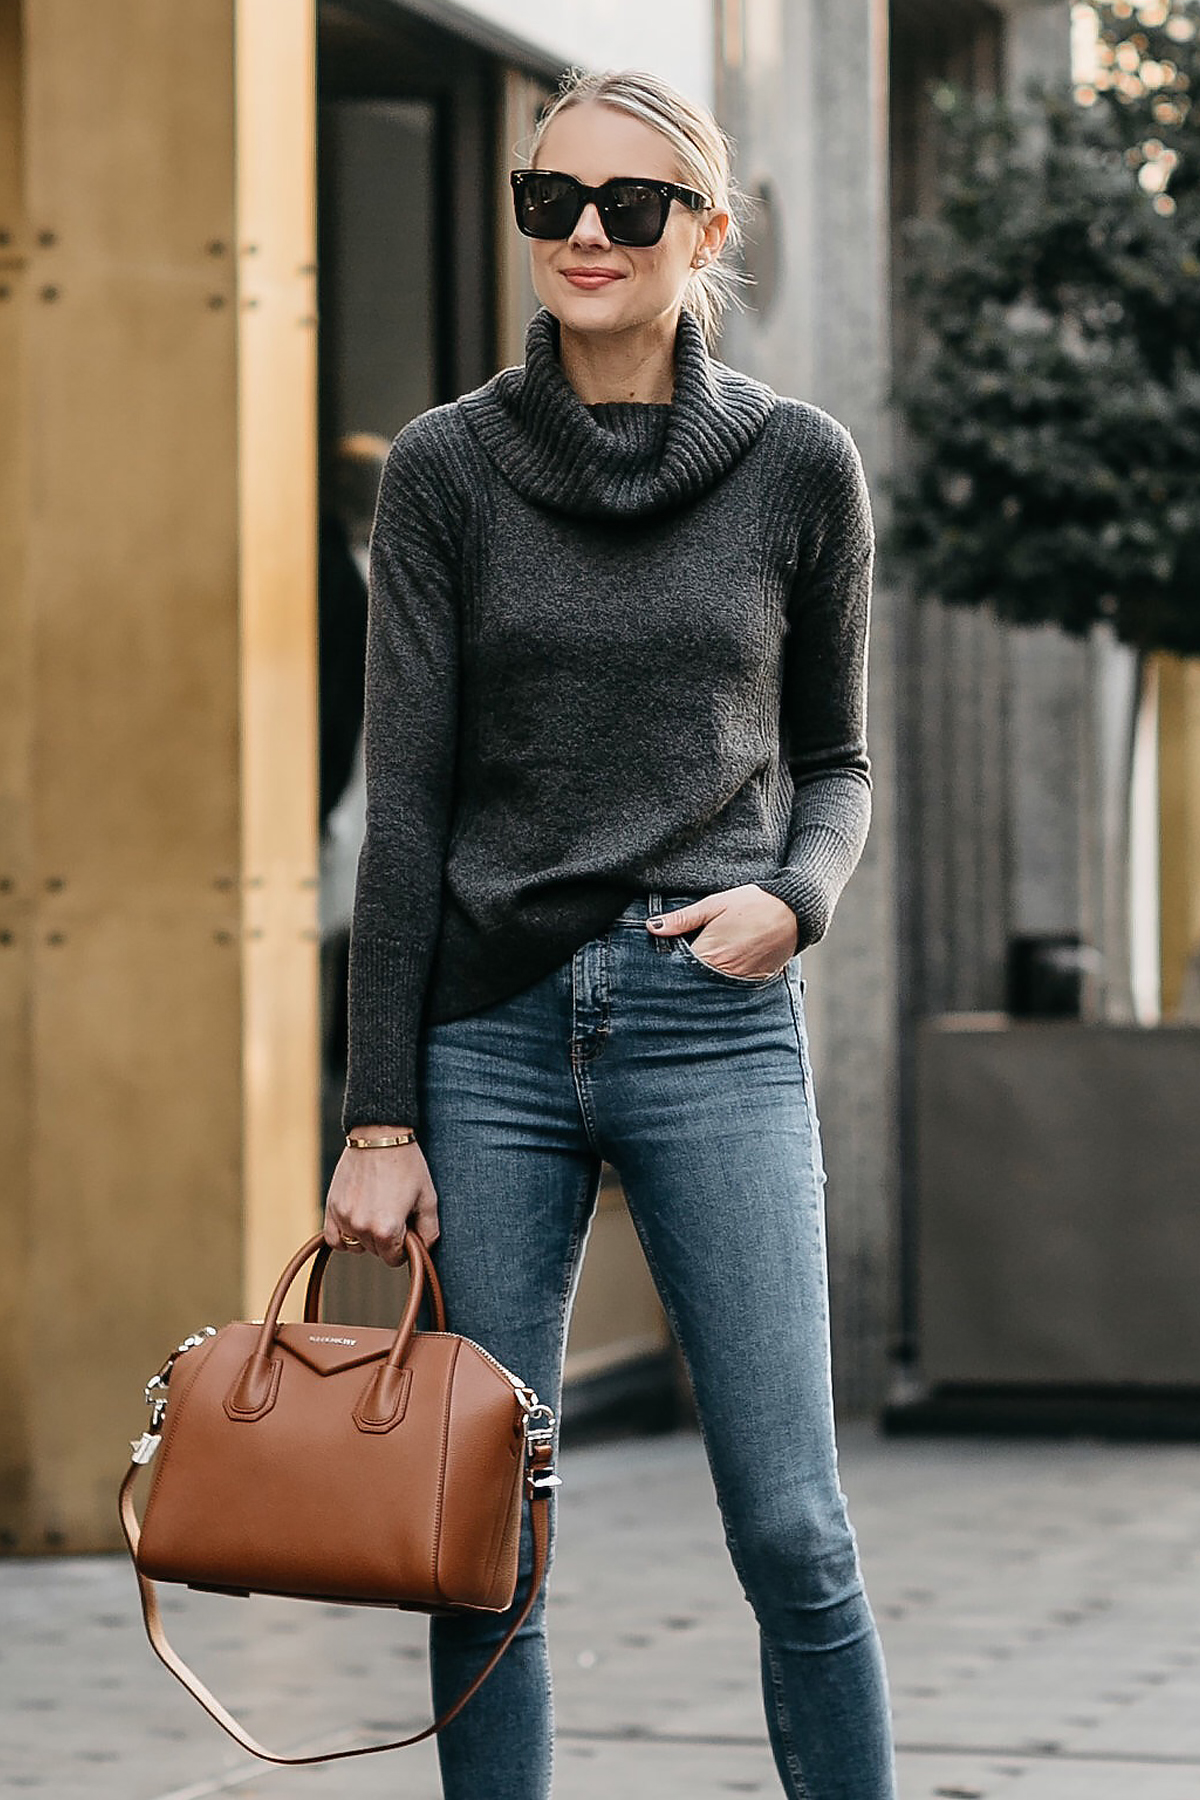 Blonde Woman Wearing Grey Turtleneck Sweater Denim Skinny Jeans Givenchy Antigona Cognac Handbag Fashion Jackson Dallas Blogger Fashion Blogger Street Style